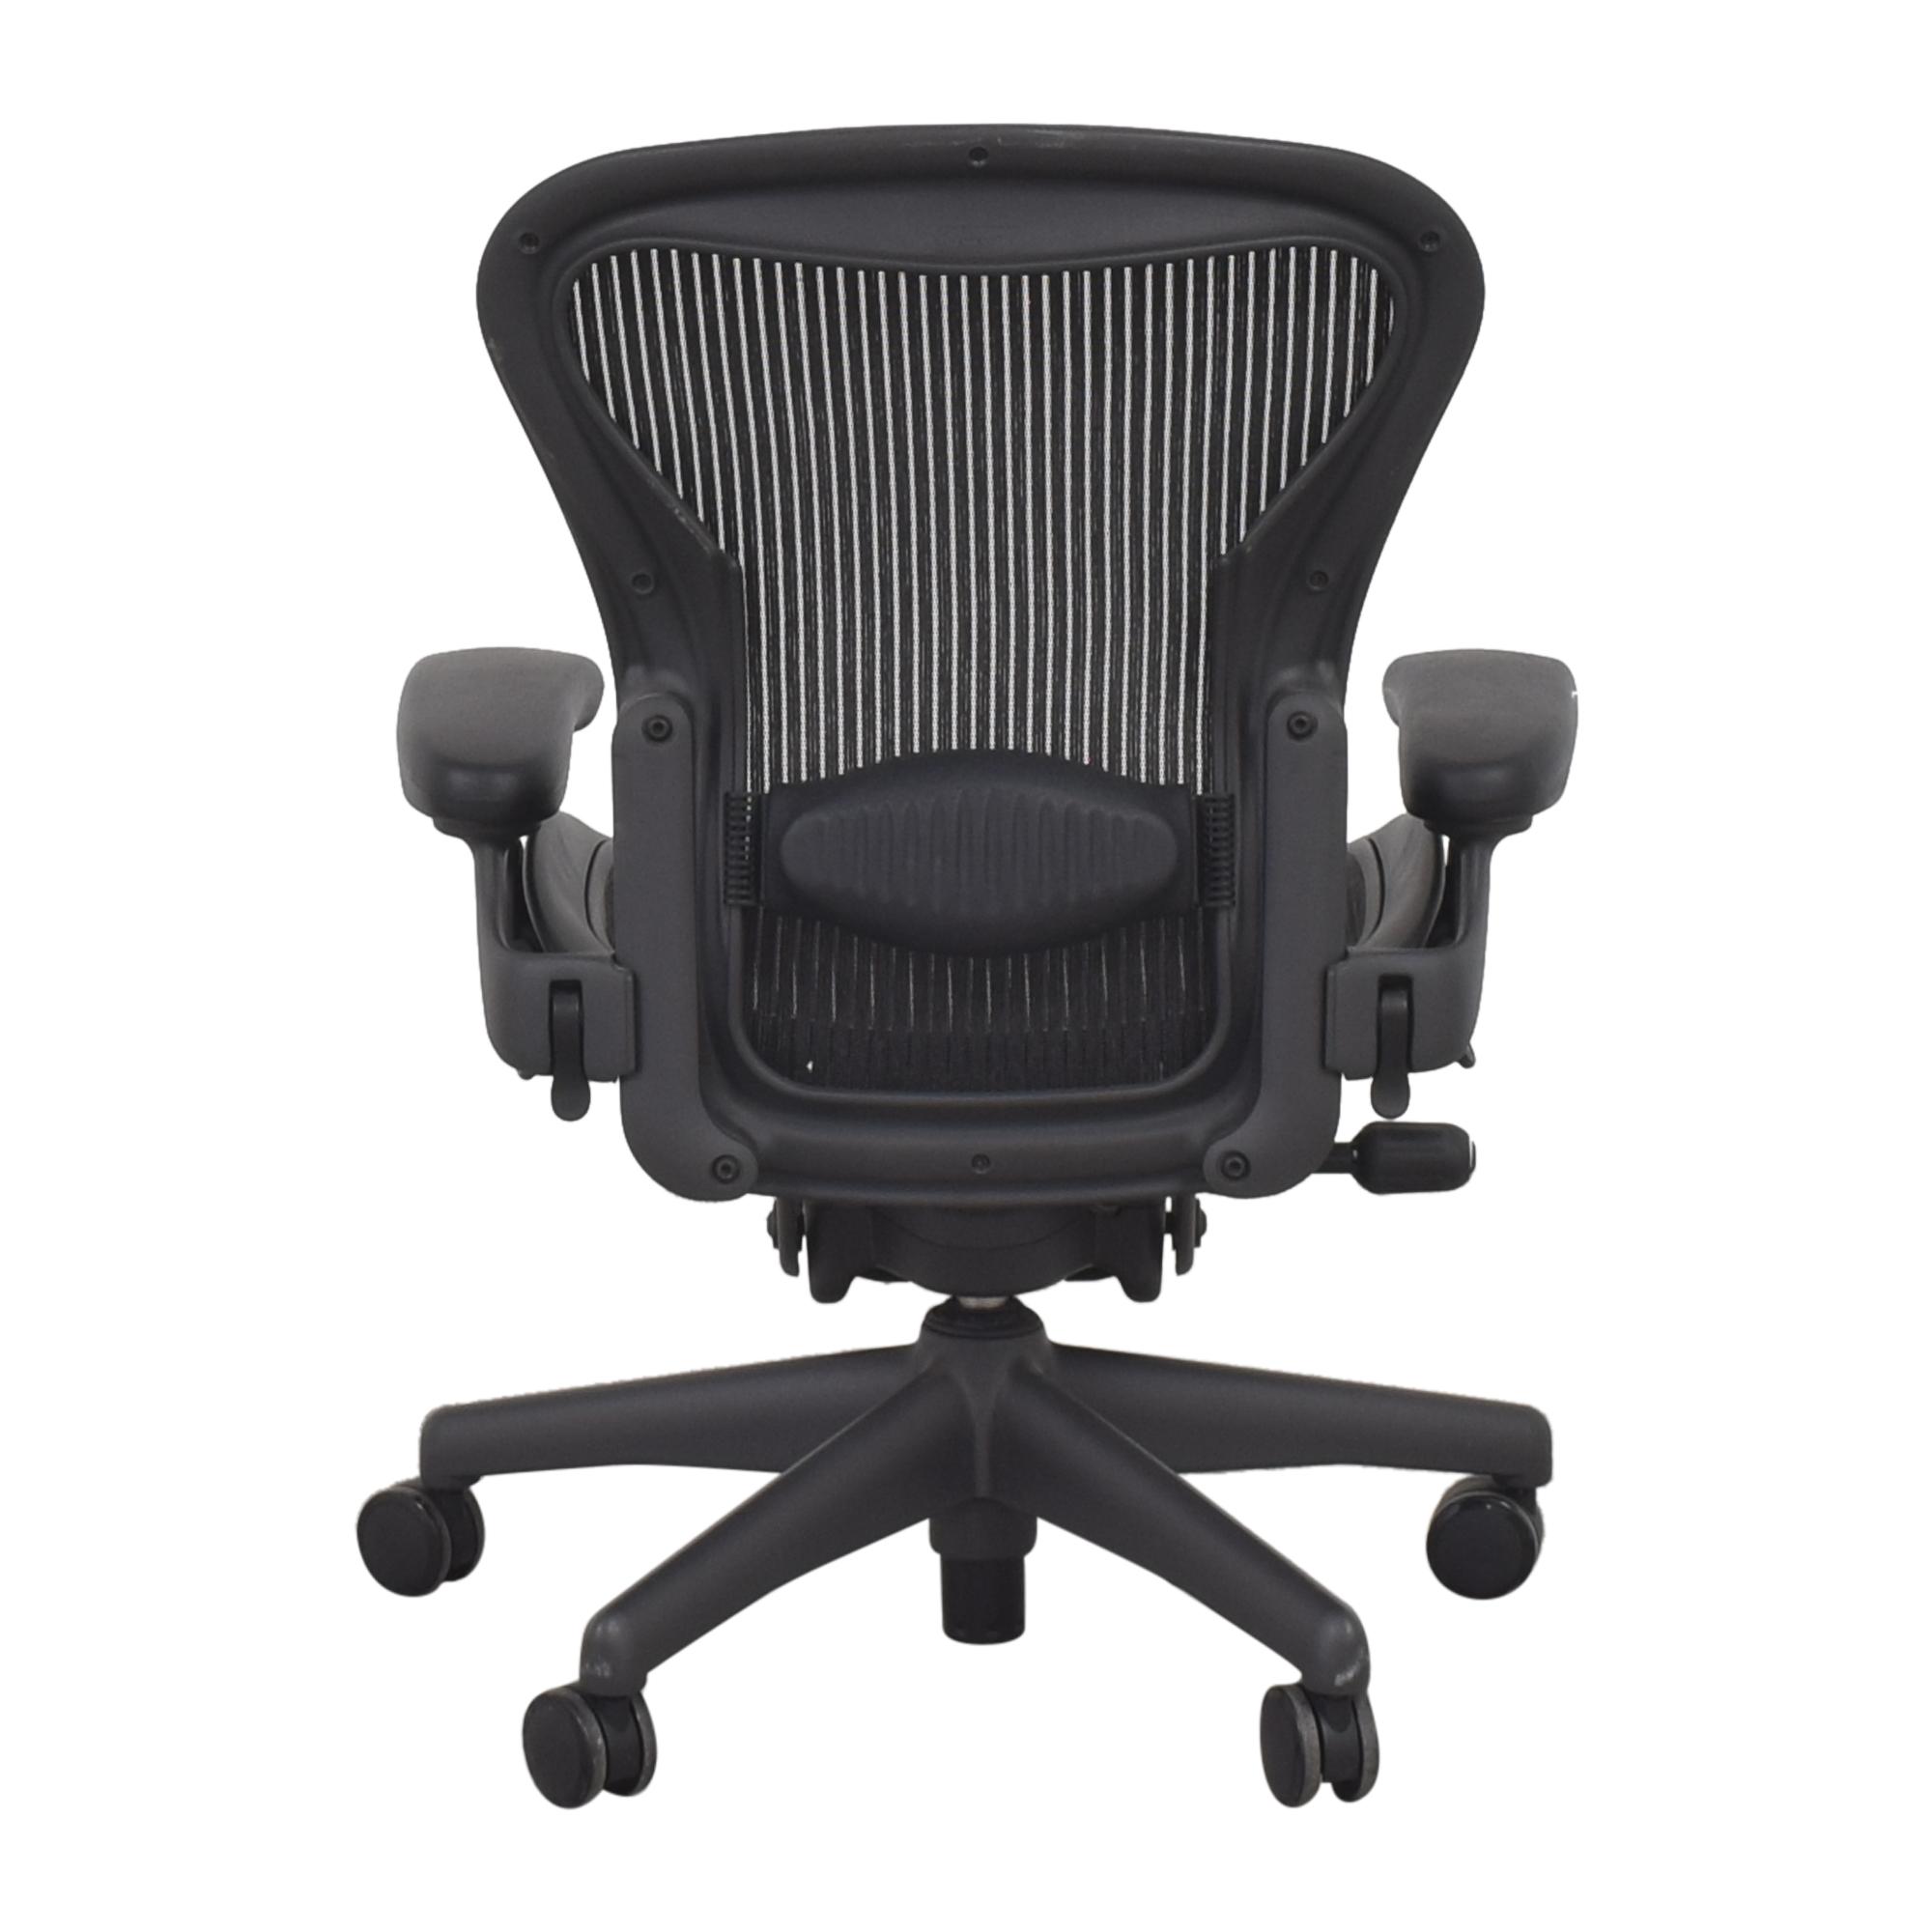 Herman Miller Herman Miller Size A Aeron Chair pa